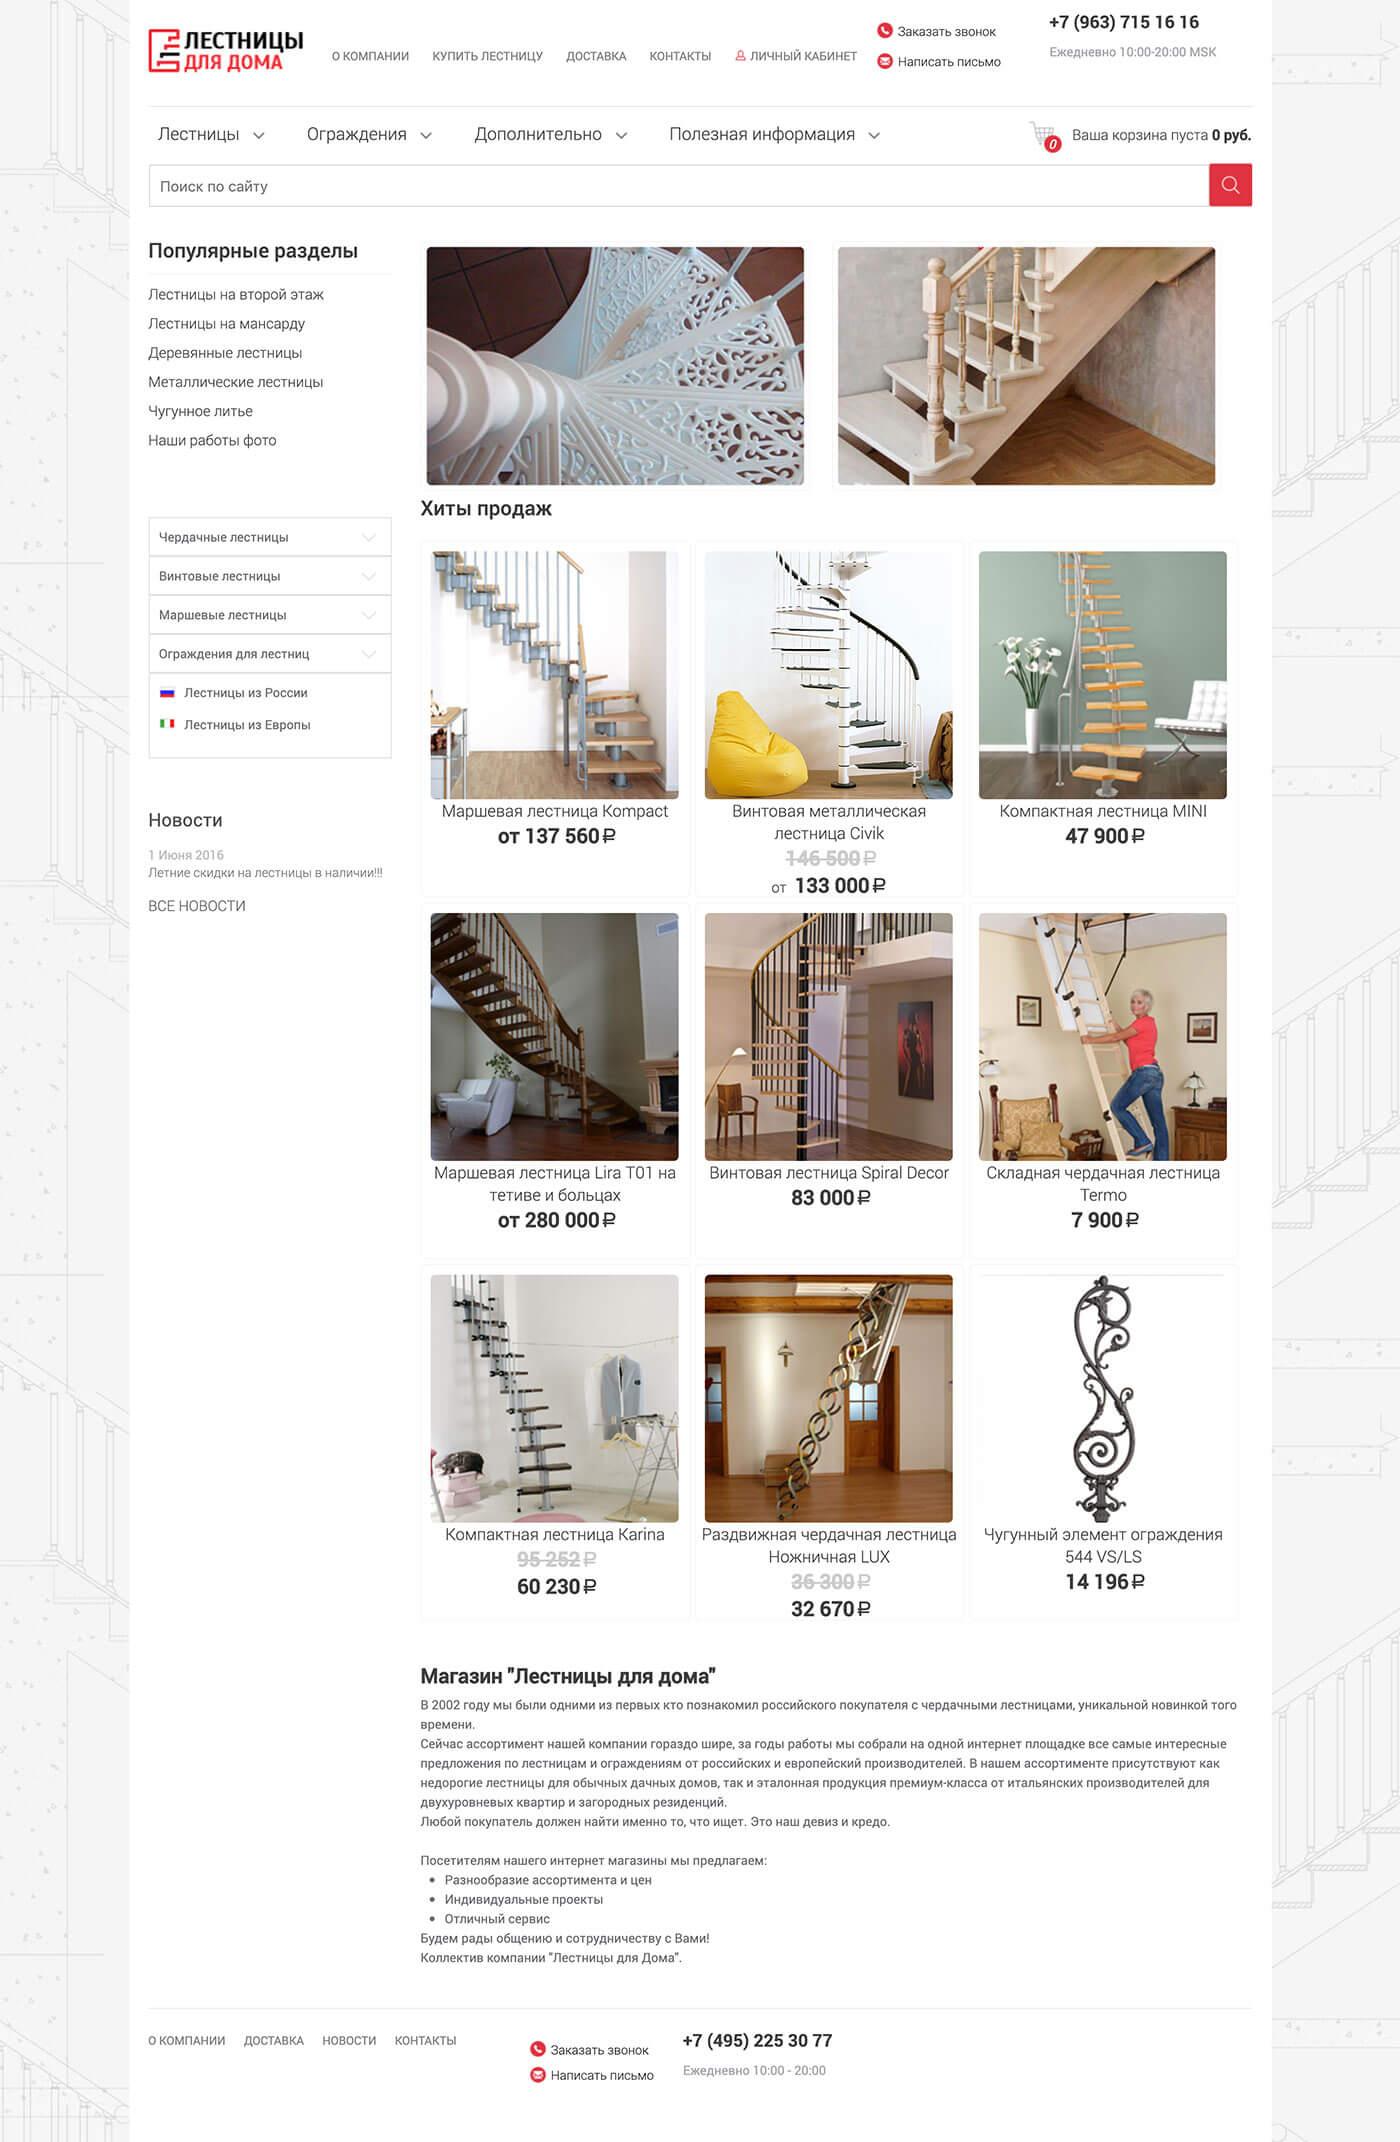 Интернет-магазин лестниц для дома